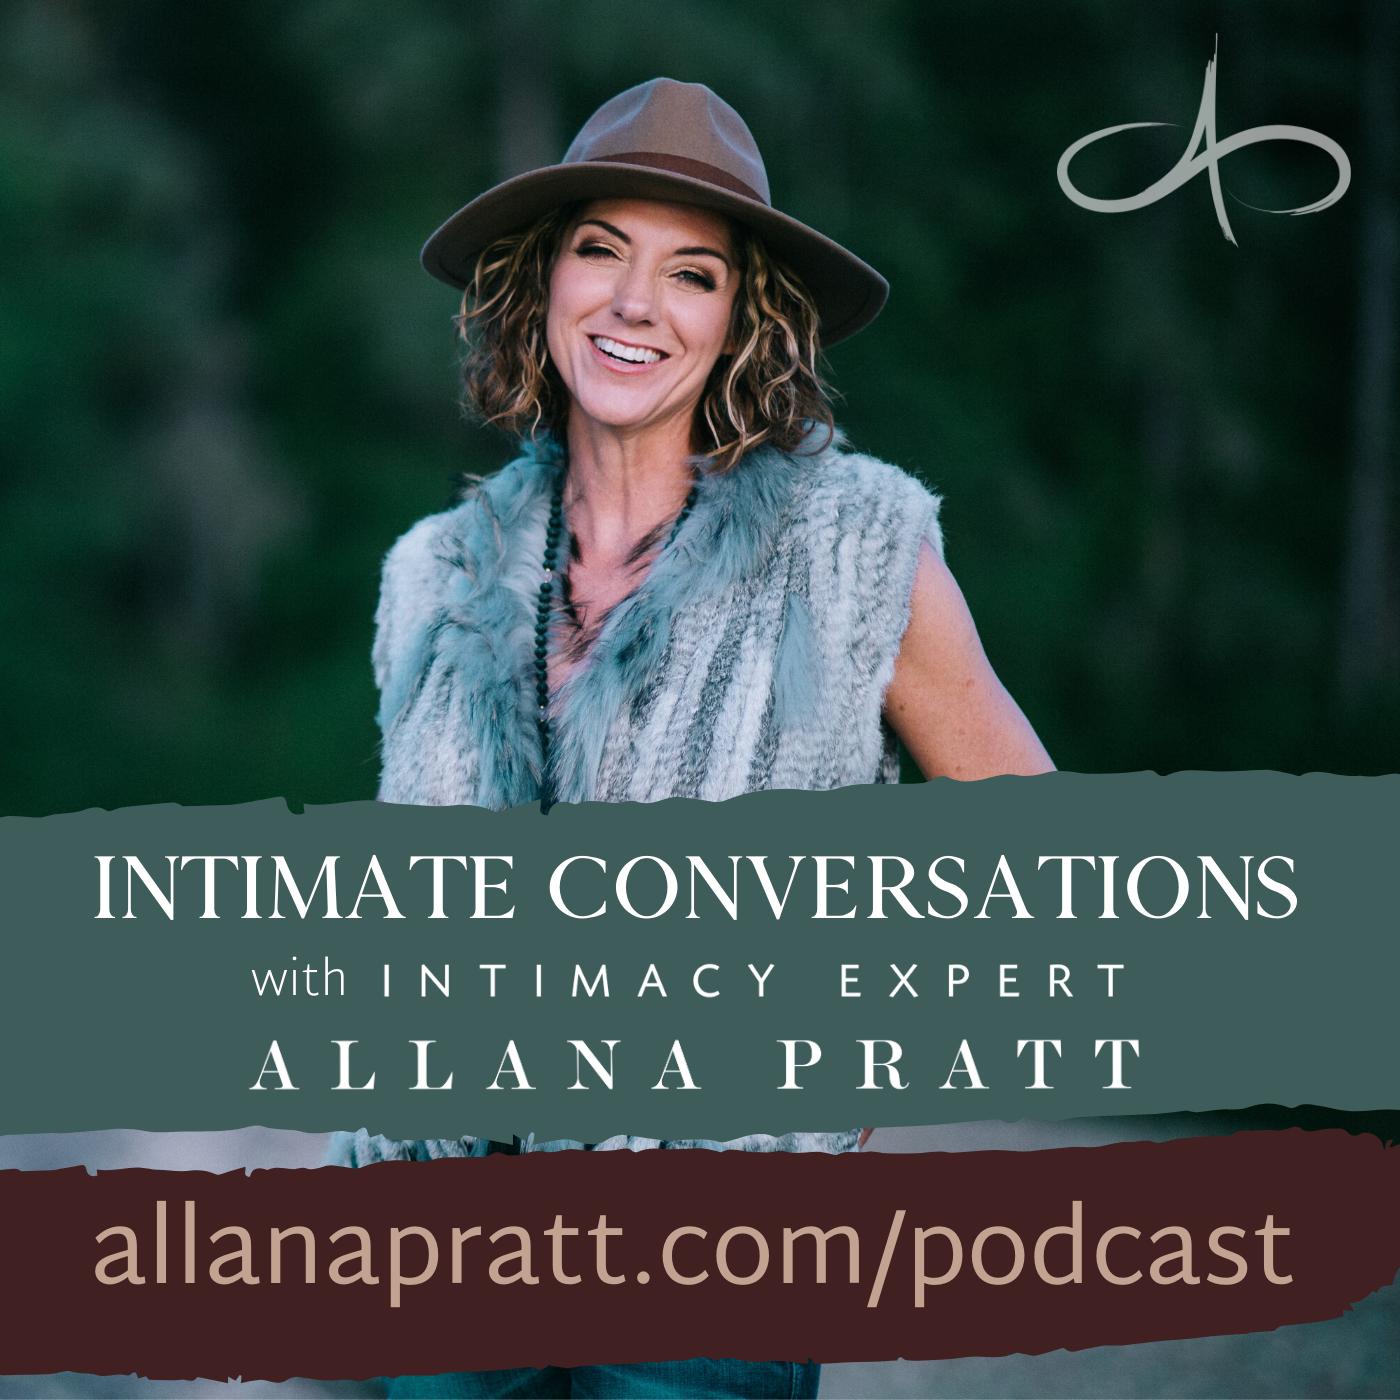 Intimate Conversations show art